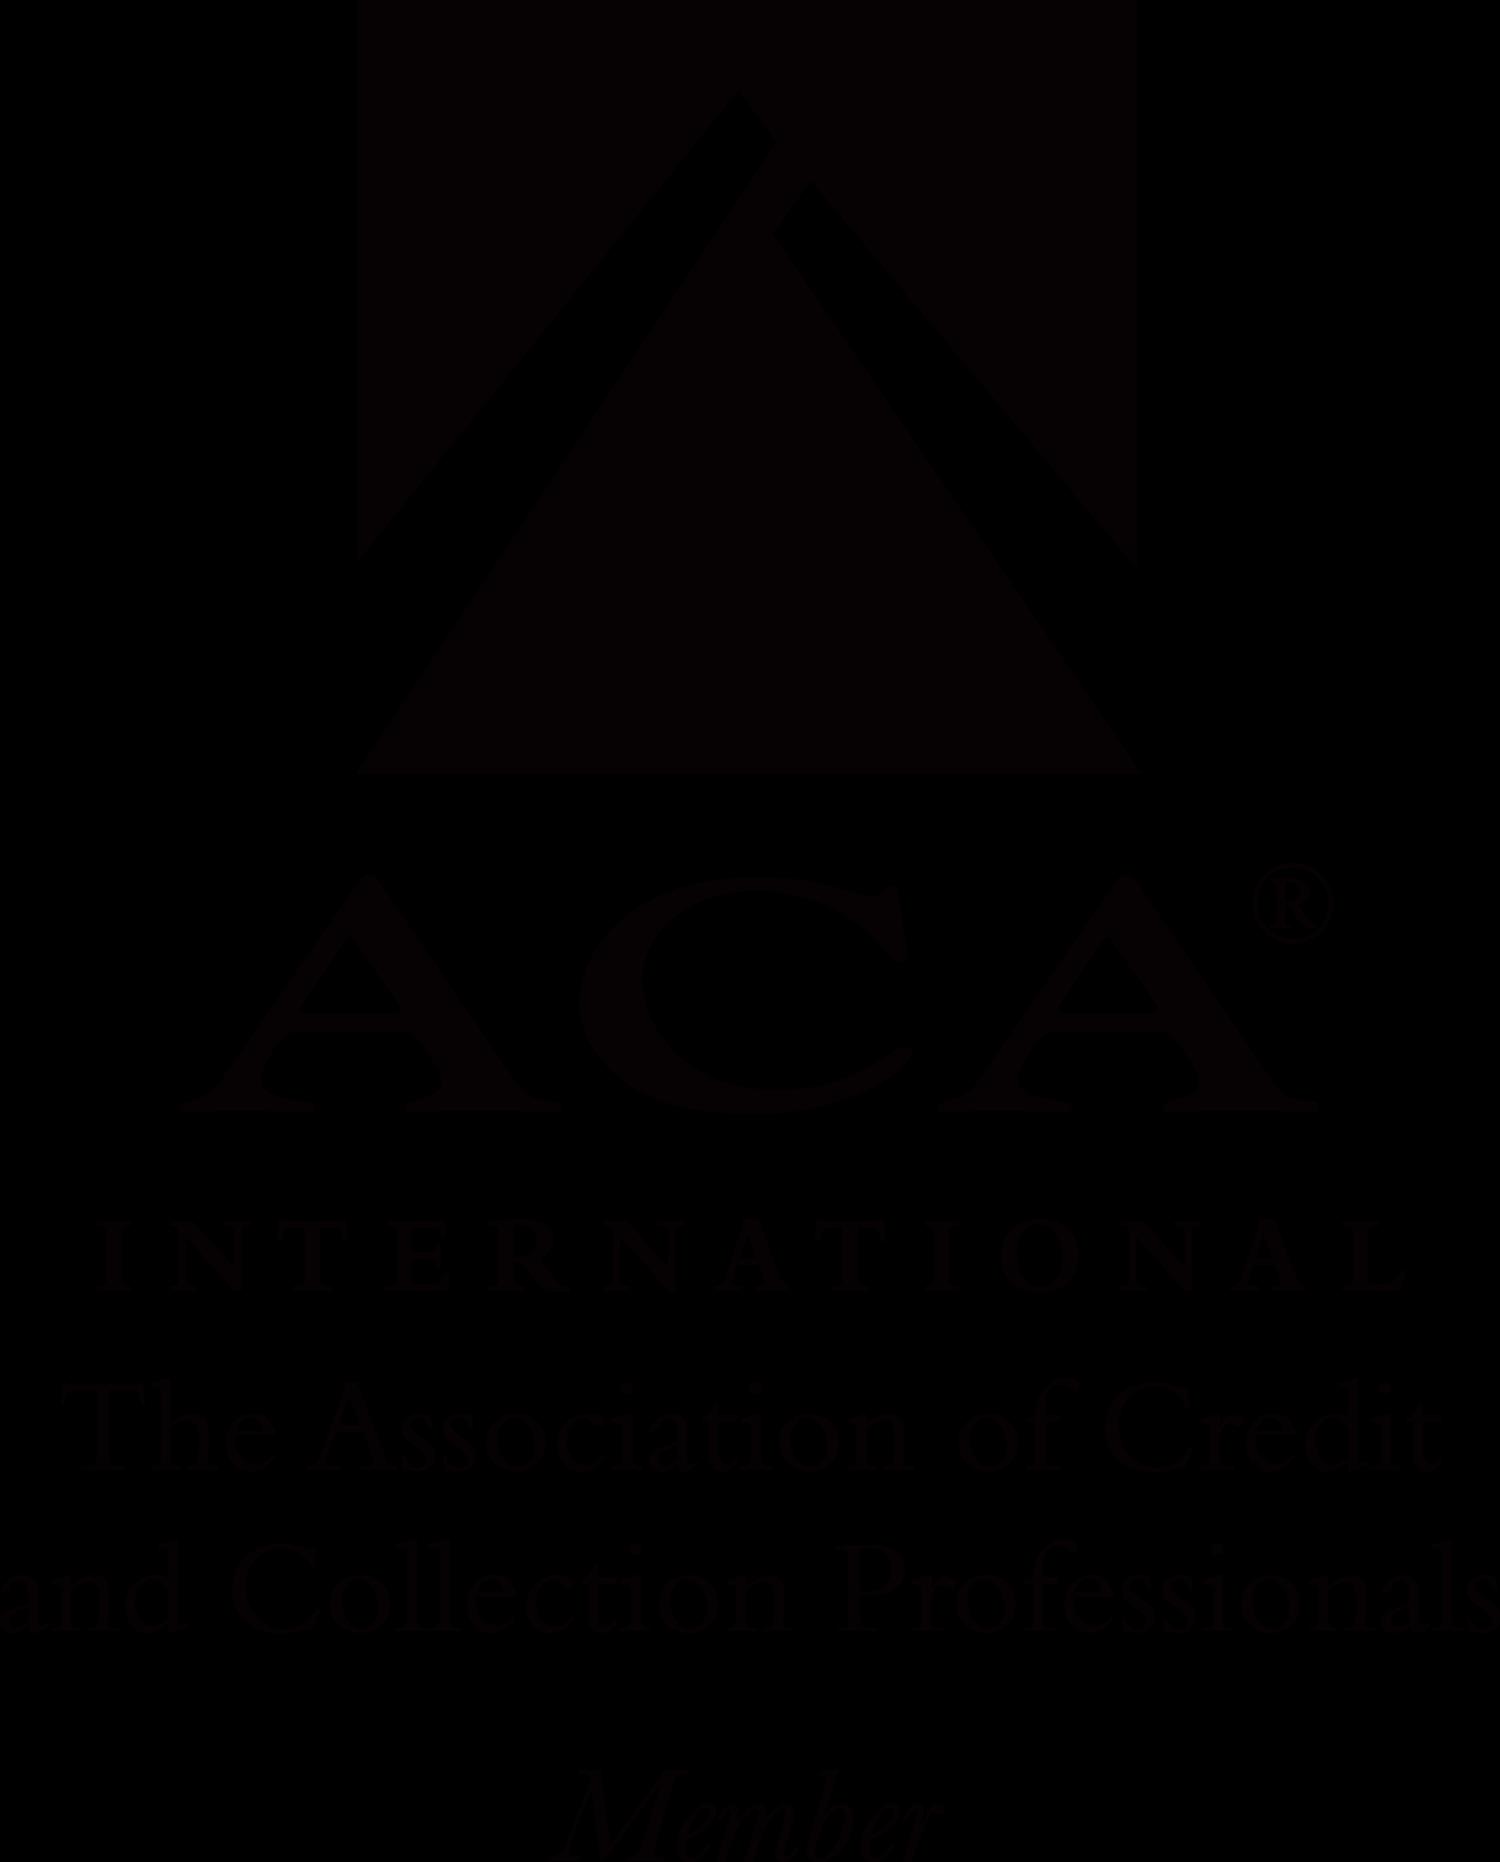 https://0201.nccdn.net/4_2/000/000/085/8ad/aca-r-member-b-1500x1862.png